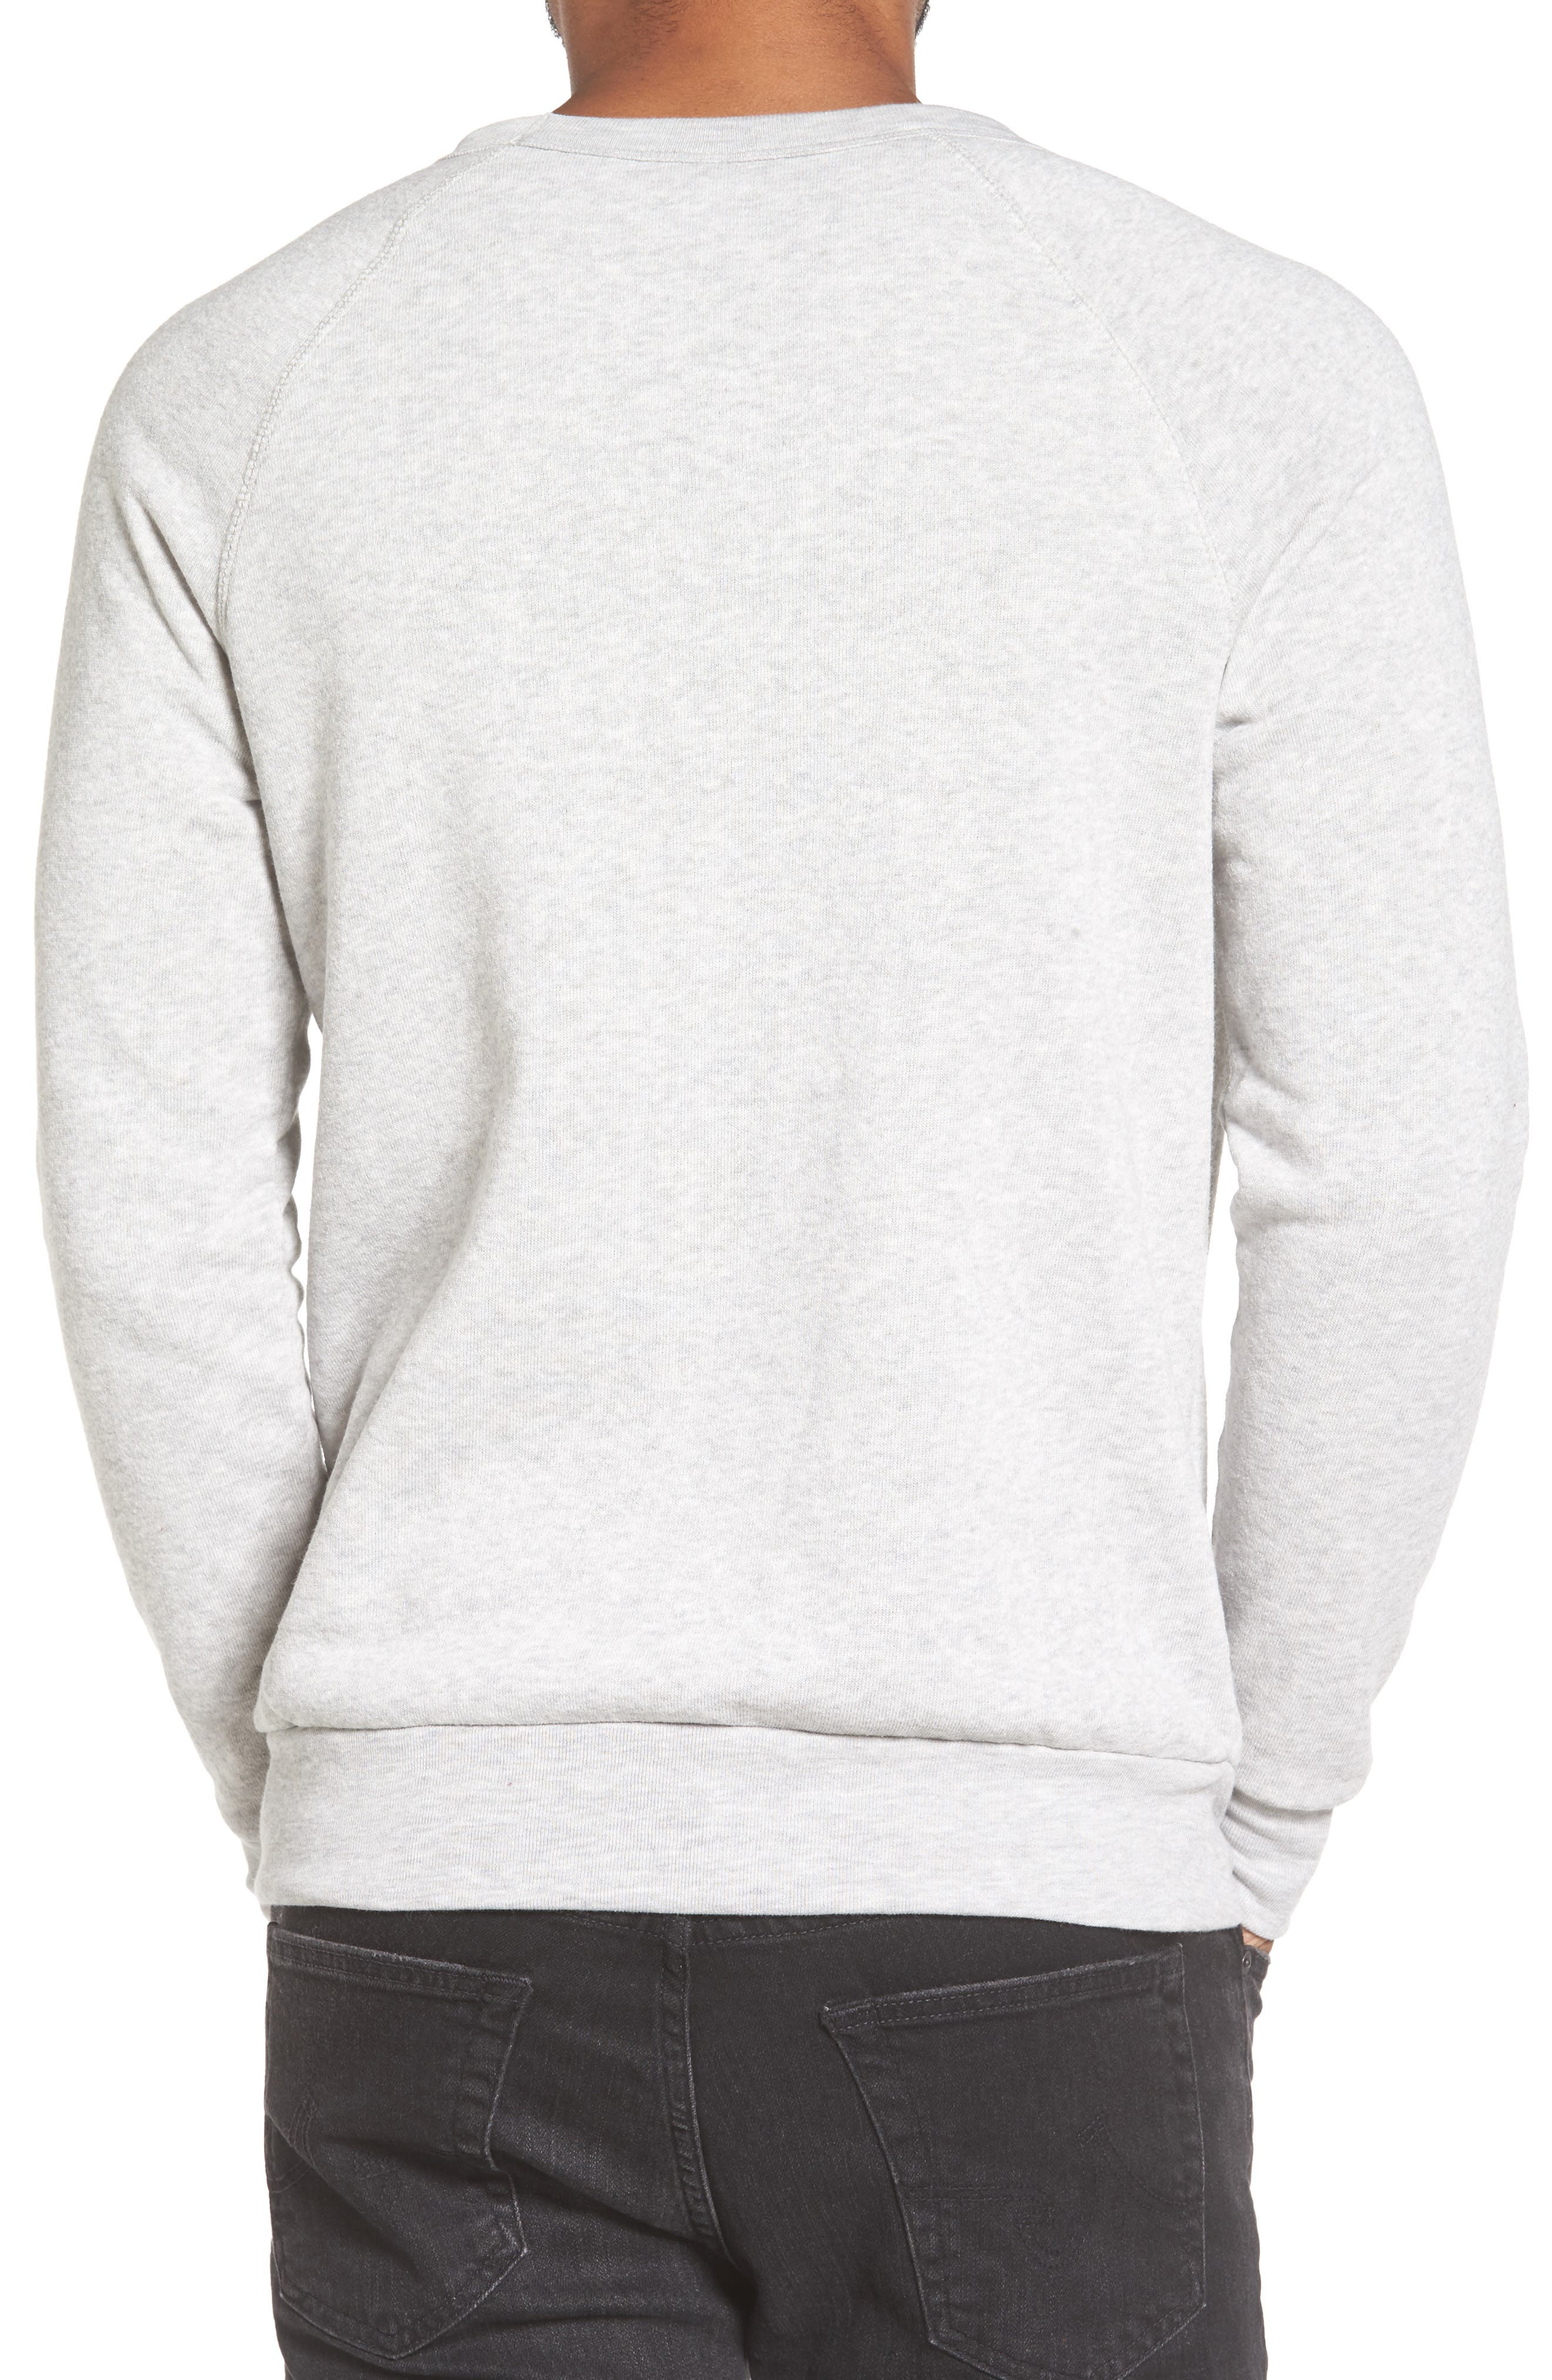 'The Champ' Sweatshirt,                             Alternate thumbnail 32, color,